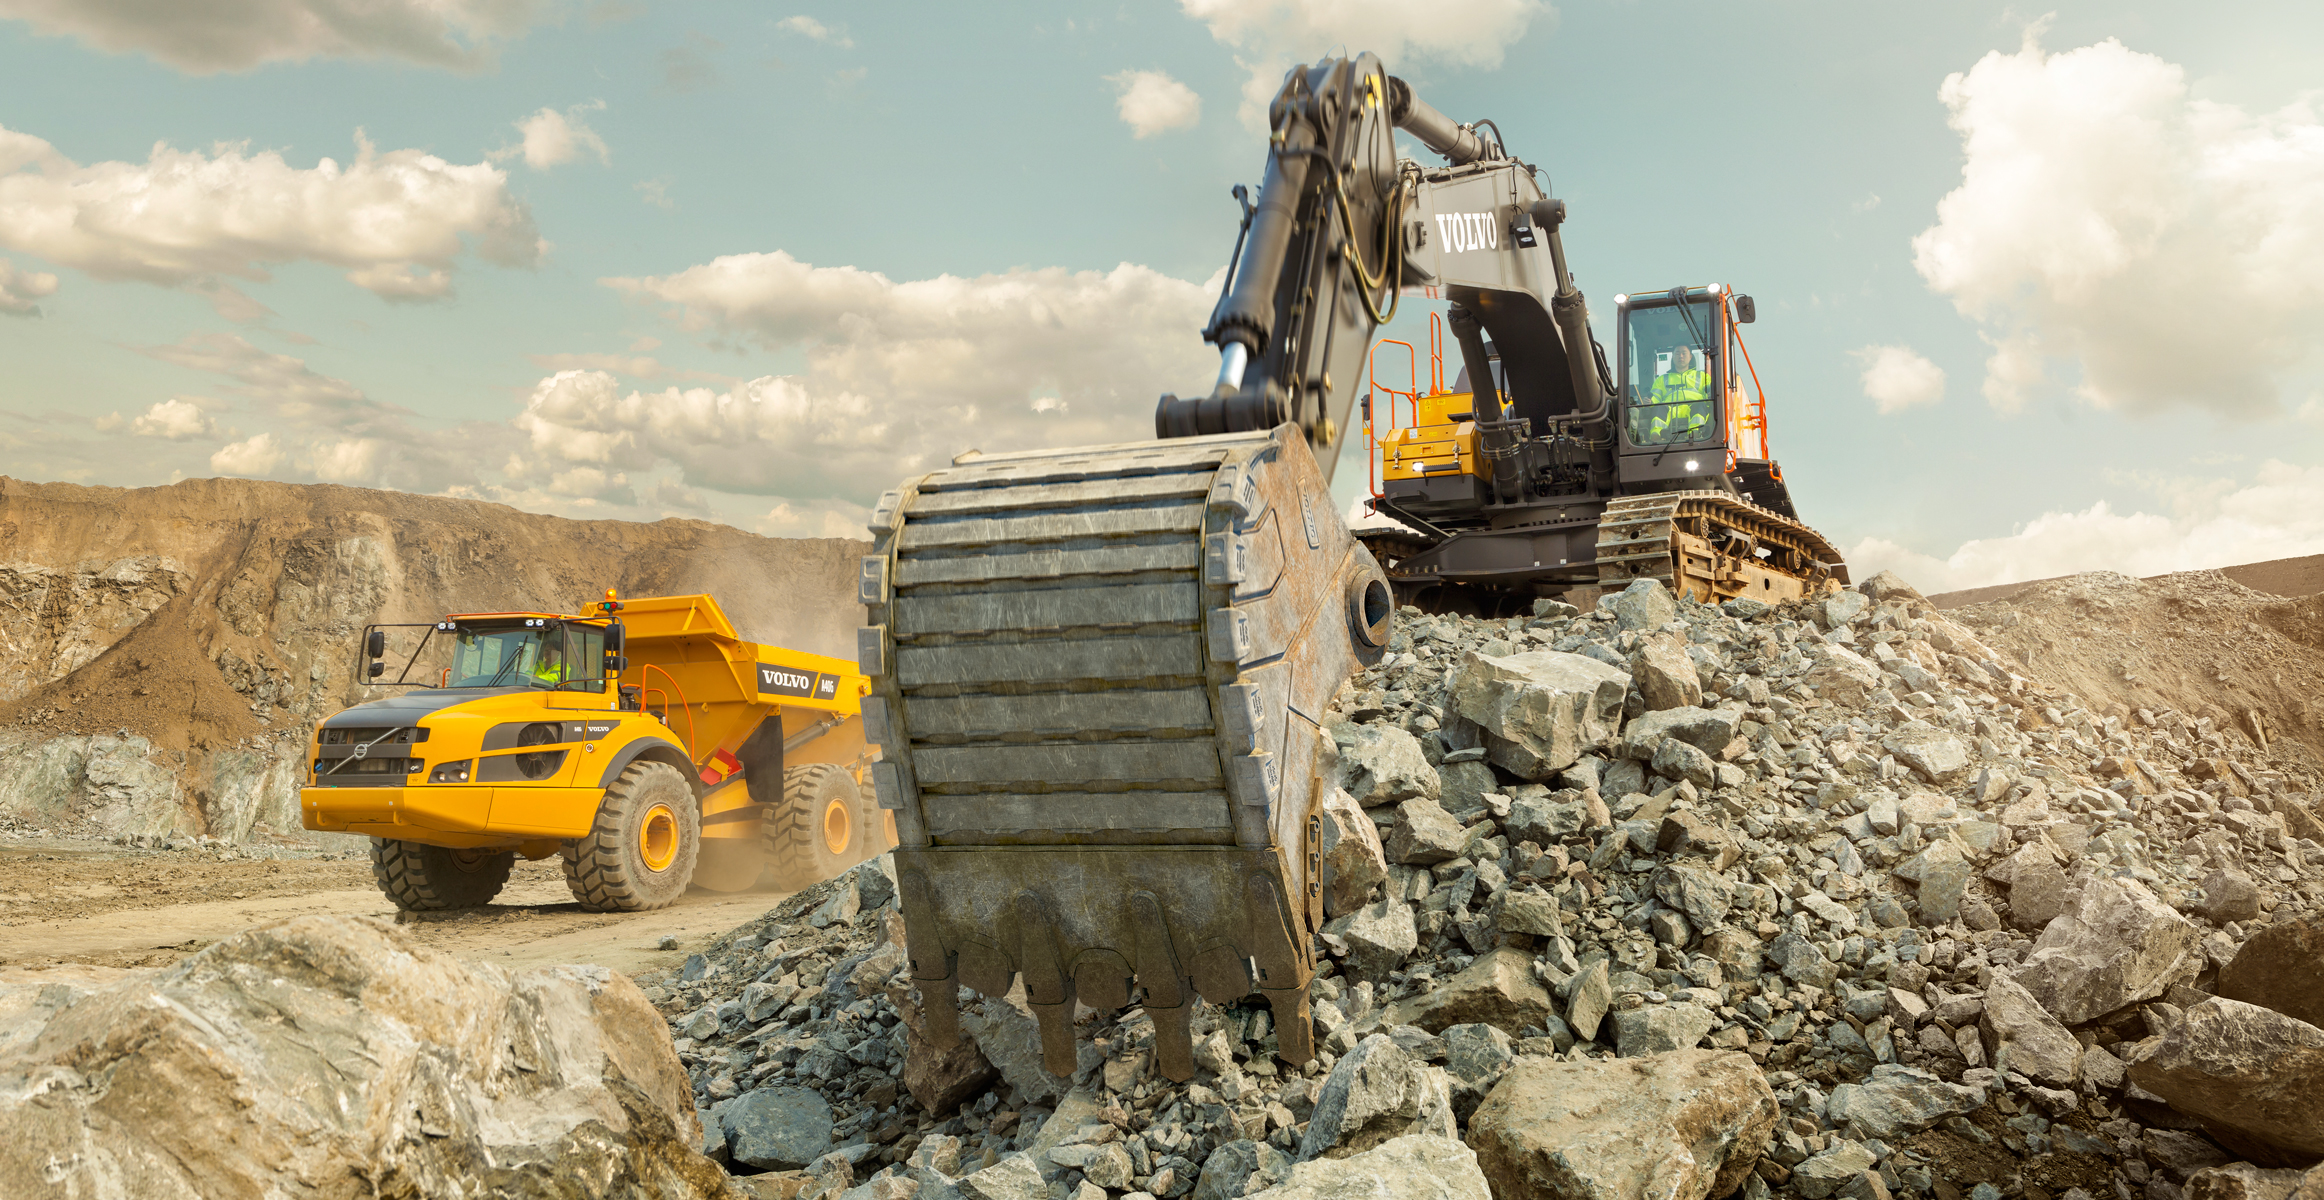 volvo-benefits-crawler-excavator-ec750e-t4f-genuinely-volvo-2324x1200.jpg